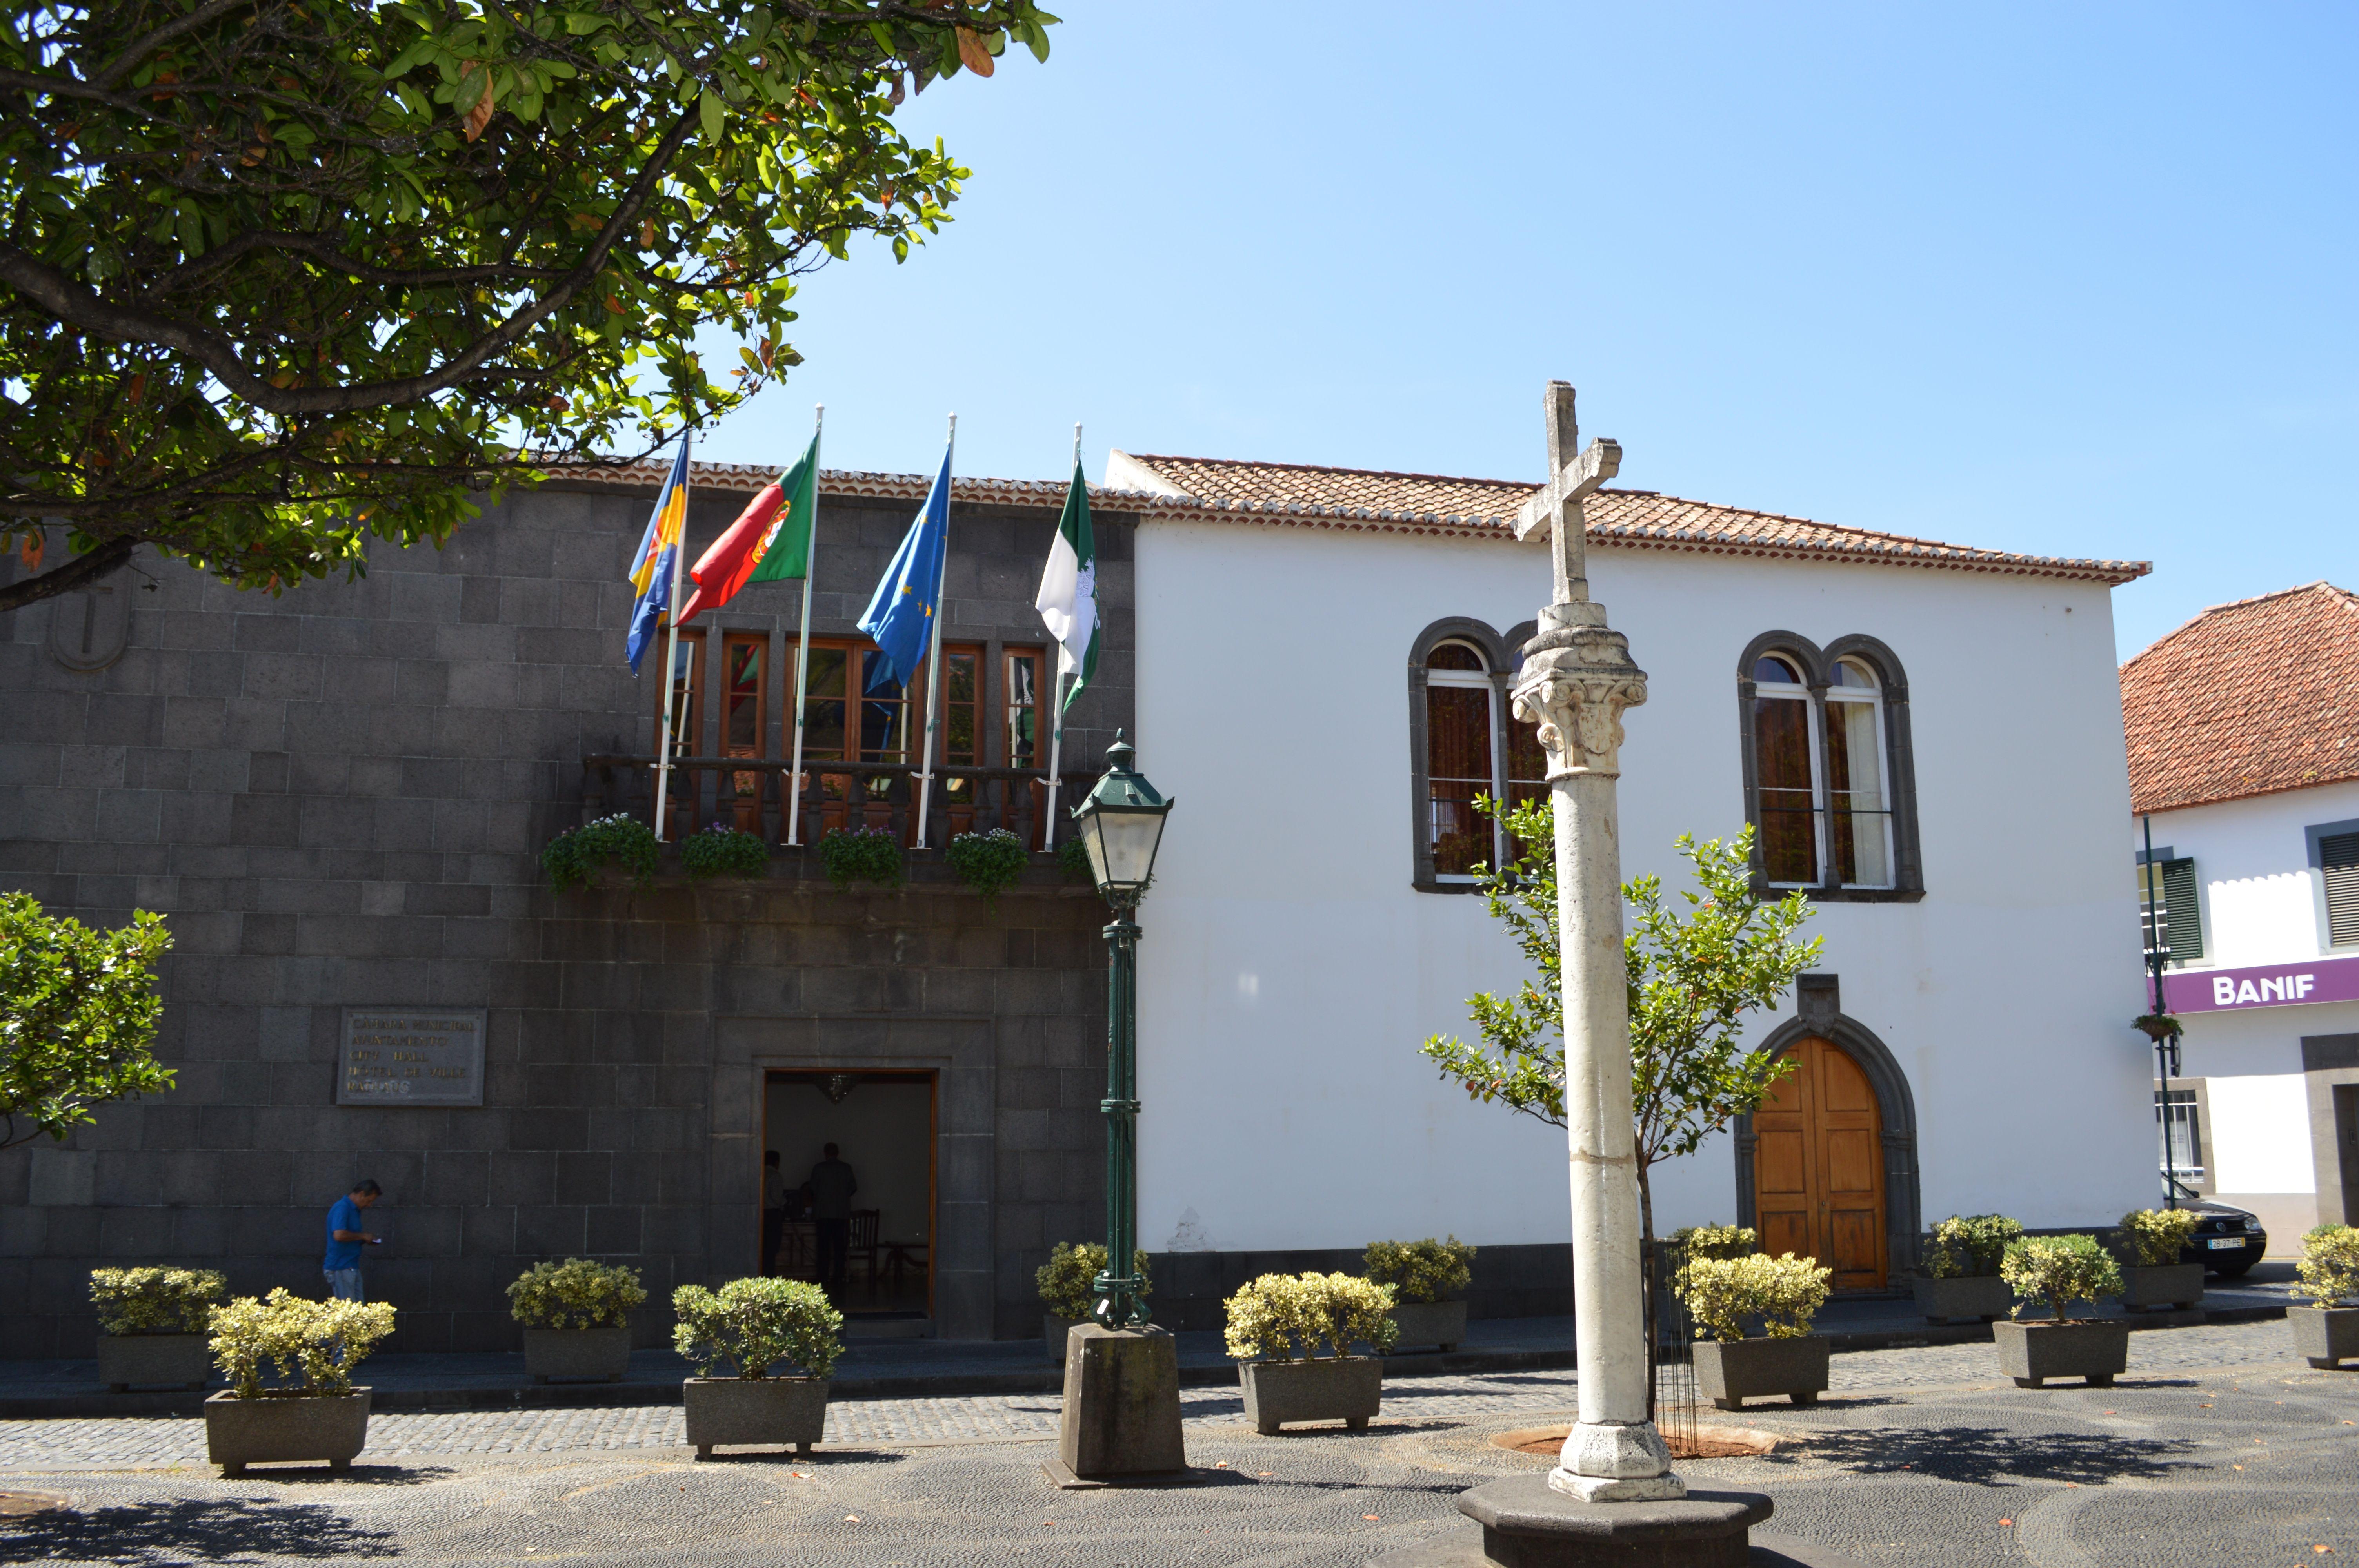 Hôtel de Ville Santa Cruz